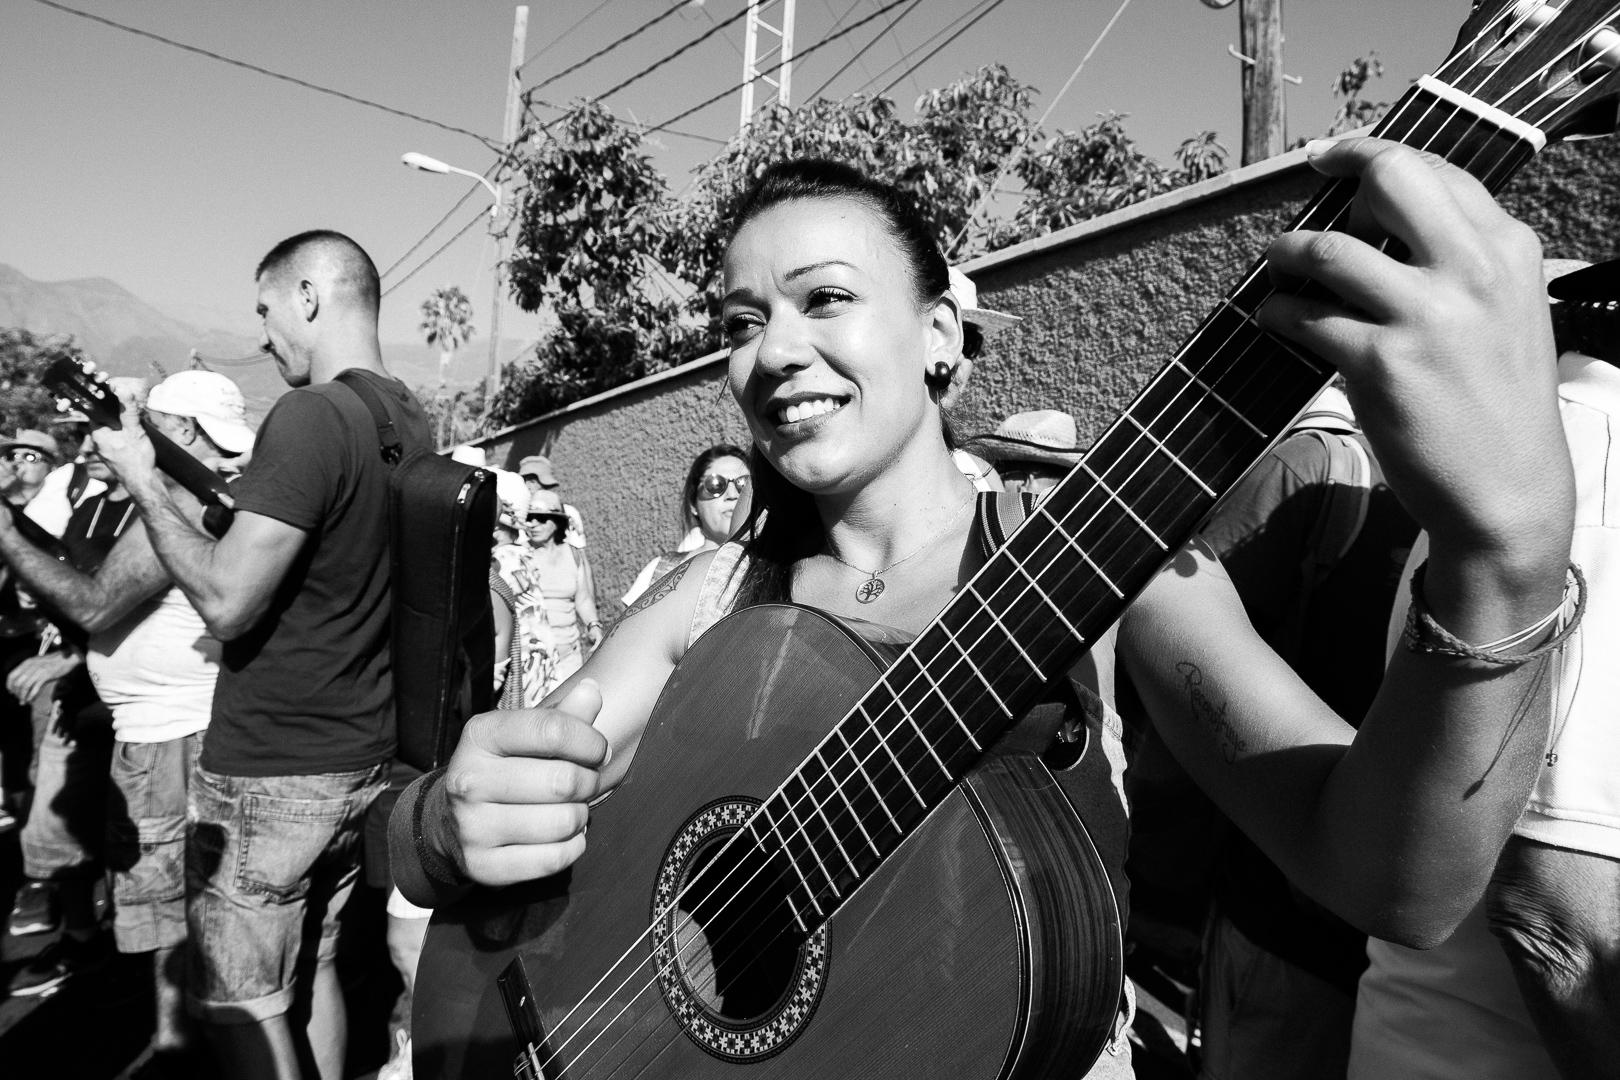 Romeria, Guimar - Socorro; Playing the guitar